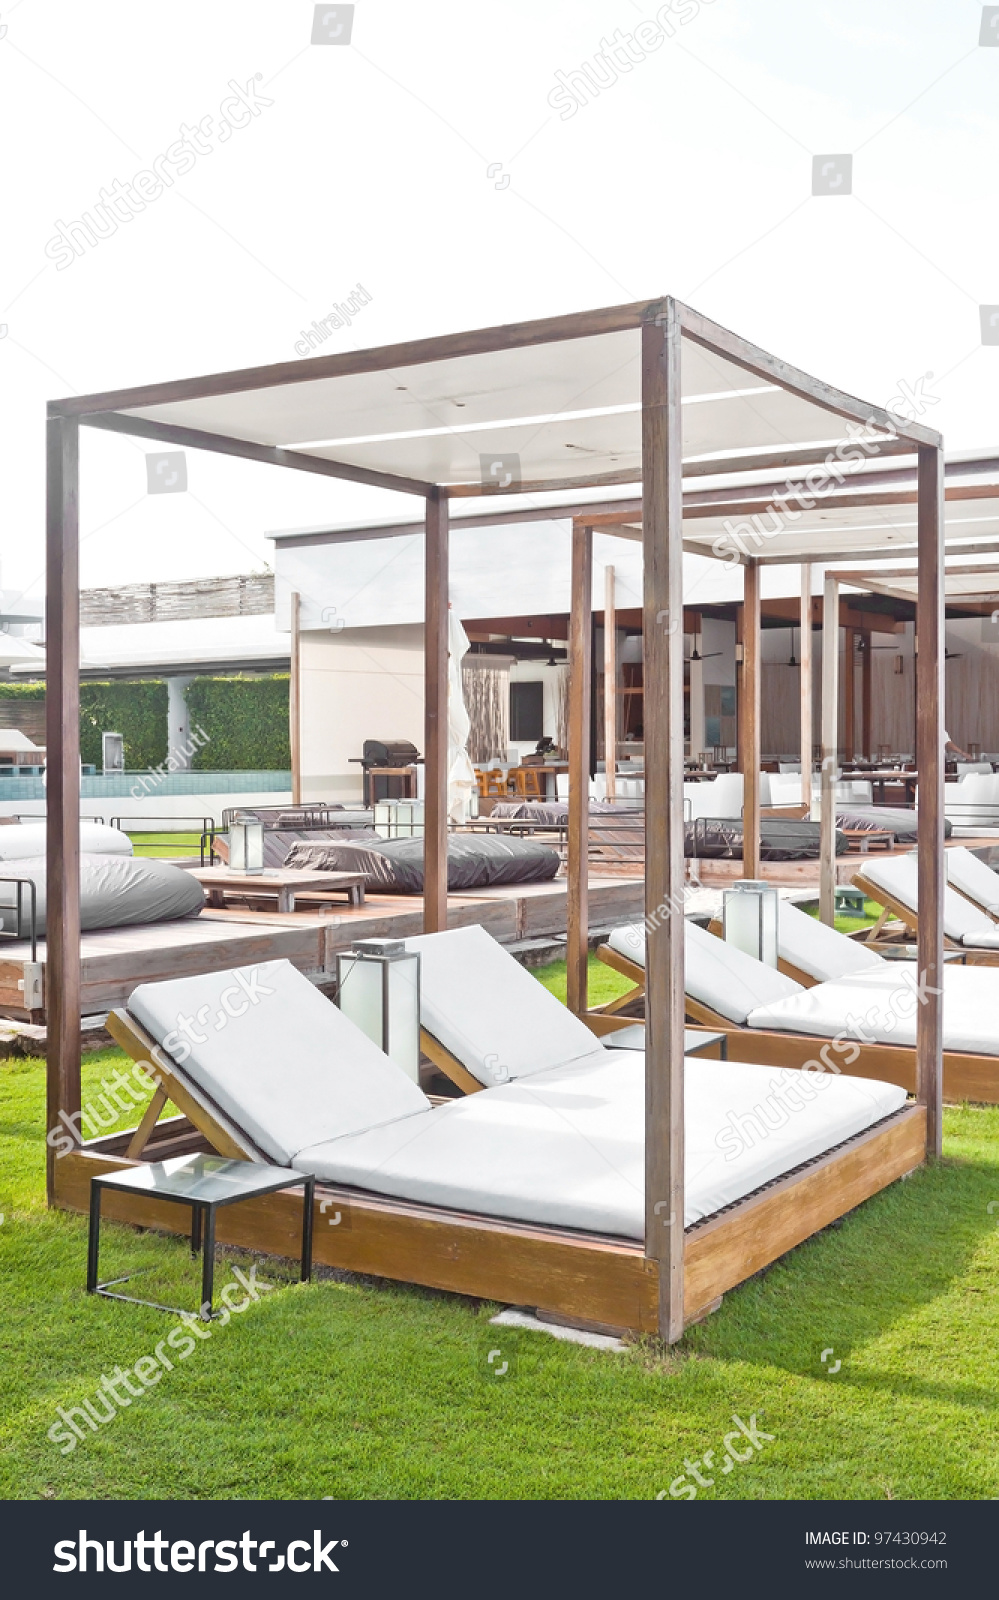 modern wooden beach pergola gazebo pavilion stock photo 97430942 shutterstock. Black Bedroom Furniture Sets. Home Design Ideas